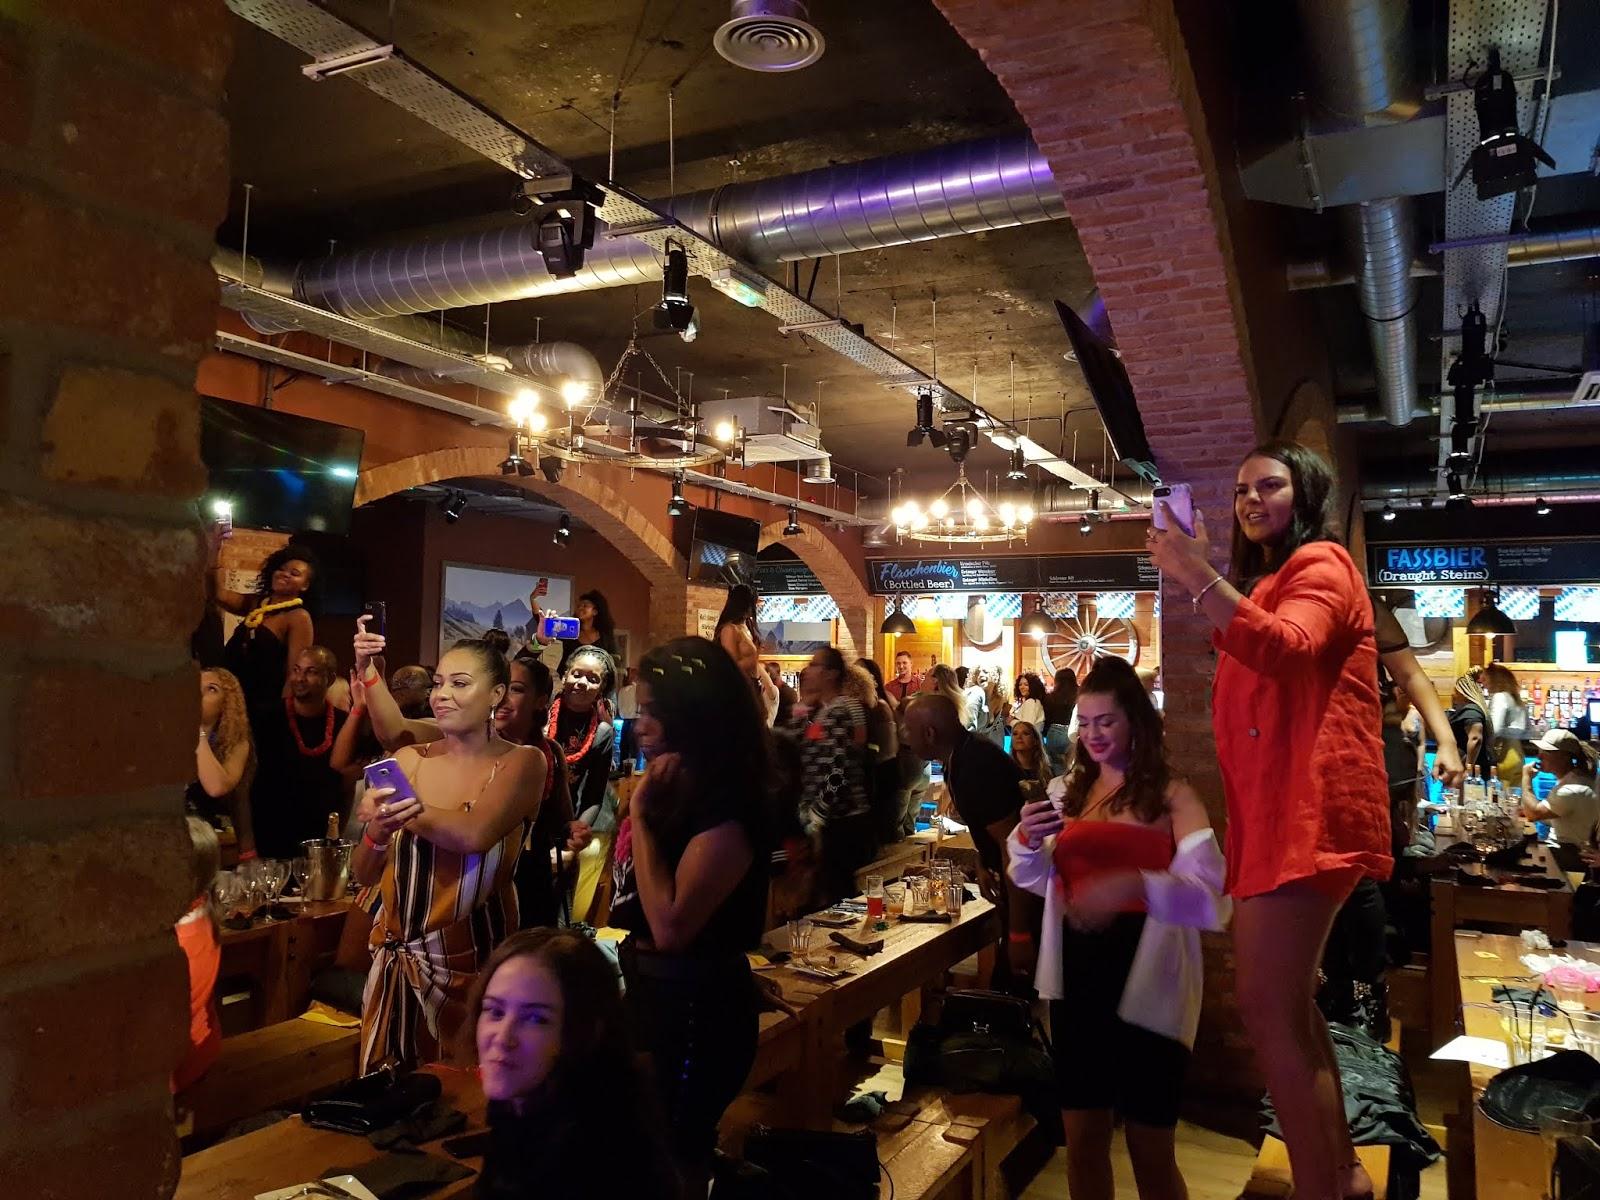 Reggae Brunch attendees dancing at Birmingham Bierkeller